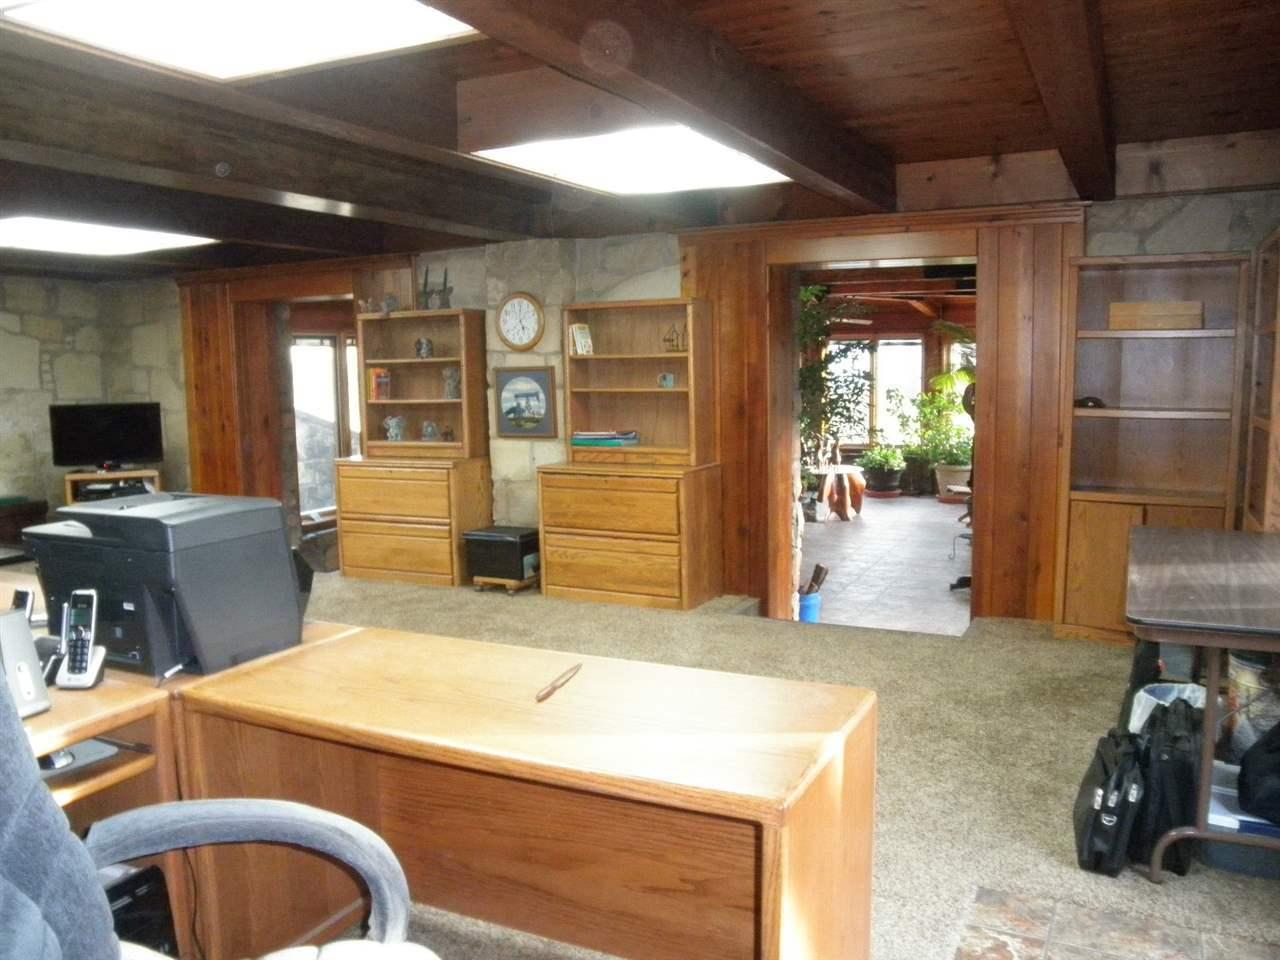 Sold Cross Sale W/ MLS | 88 Elmwood  Ponca City, OK 74601 34